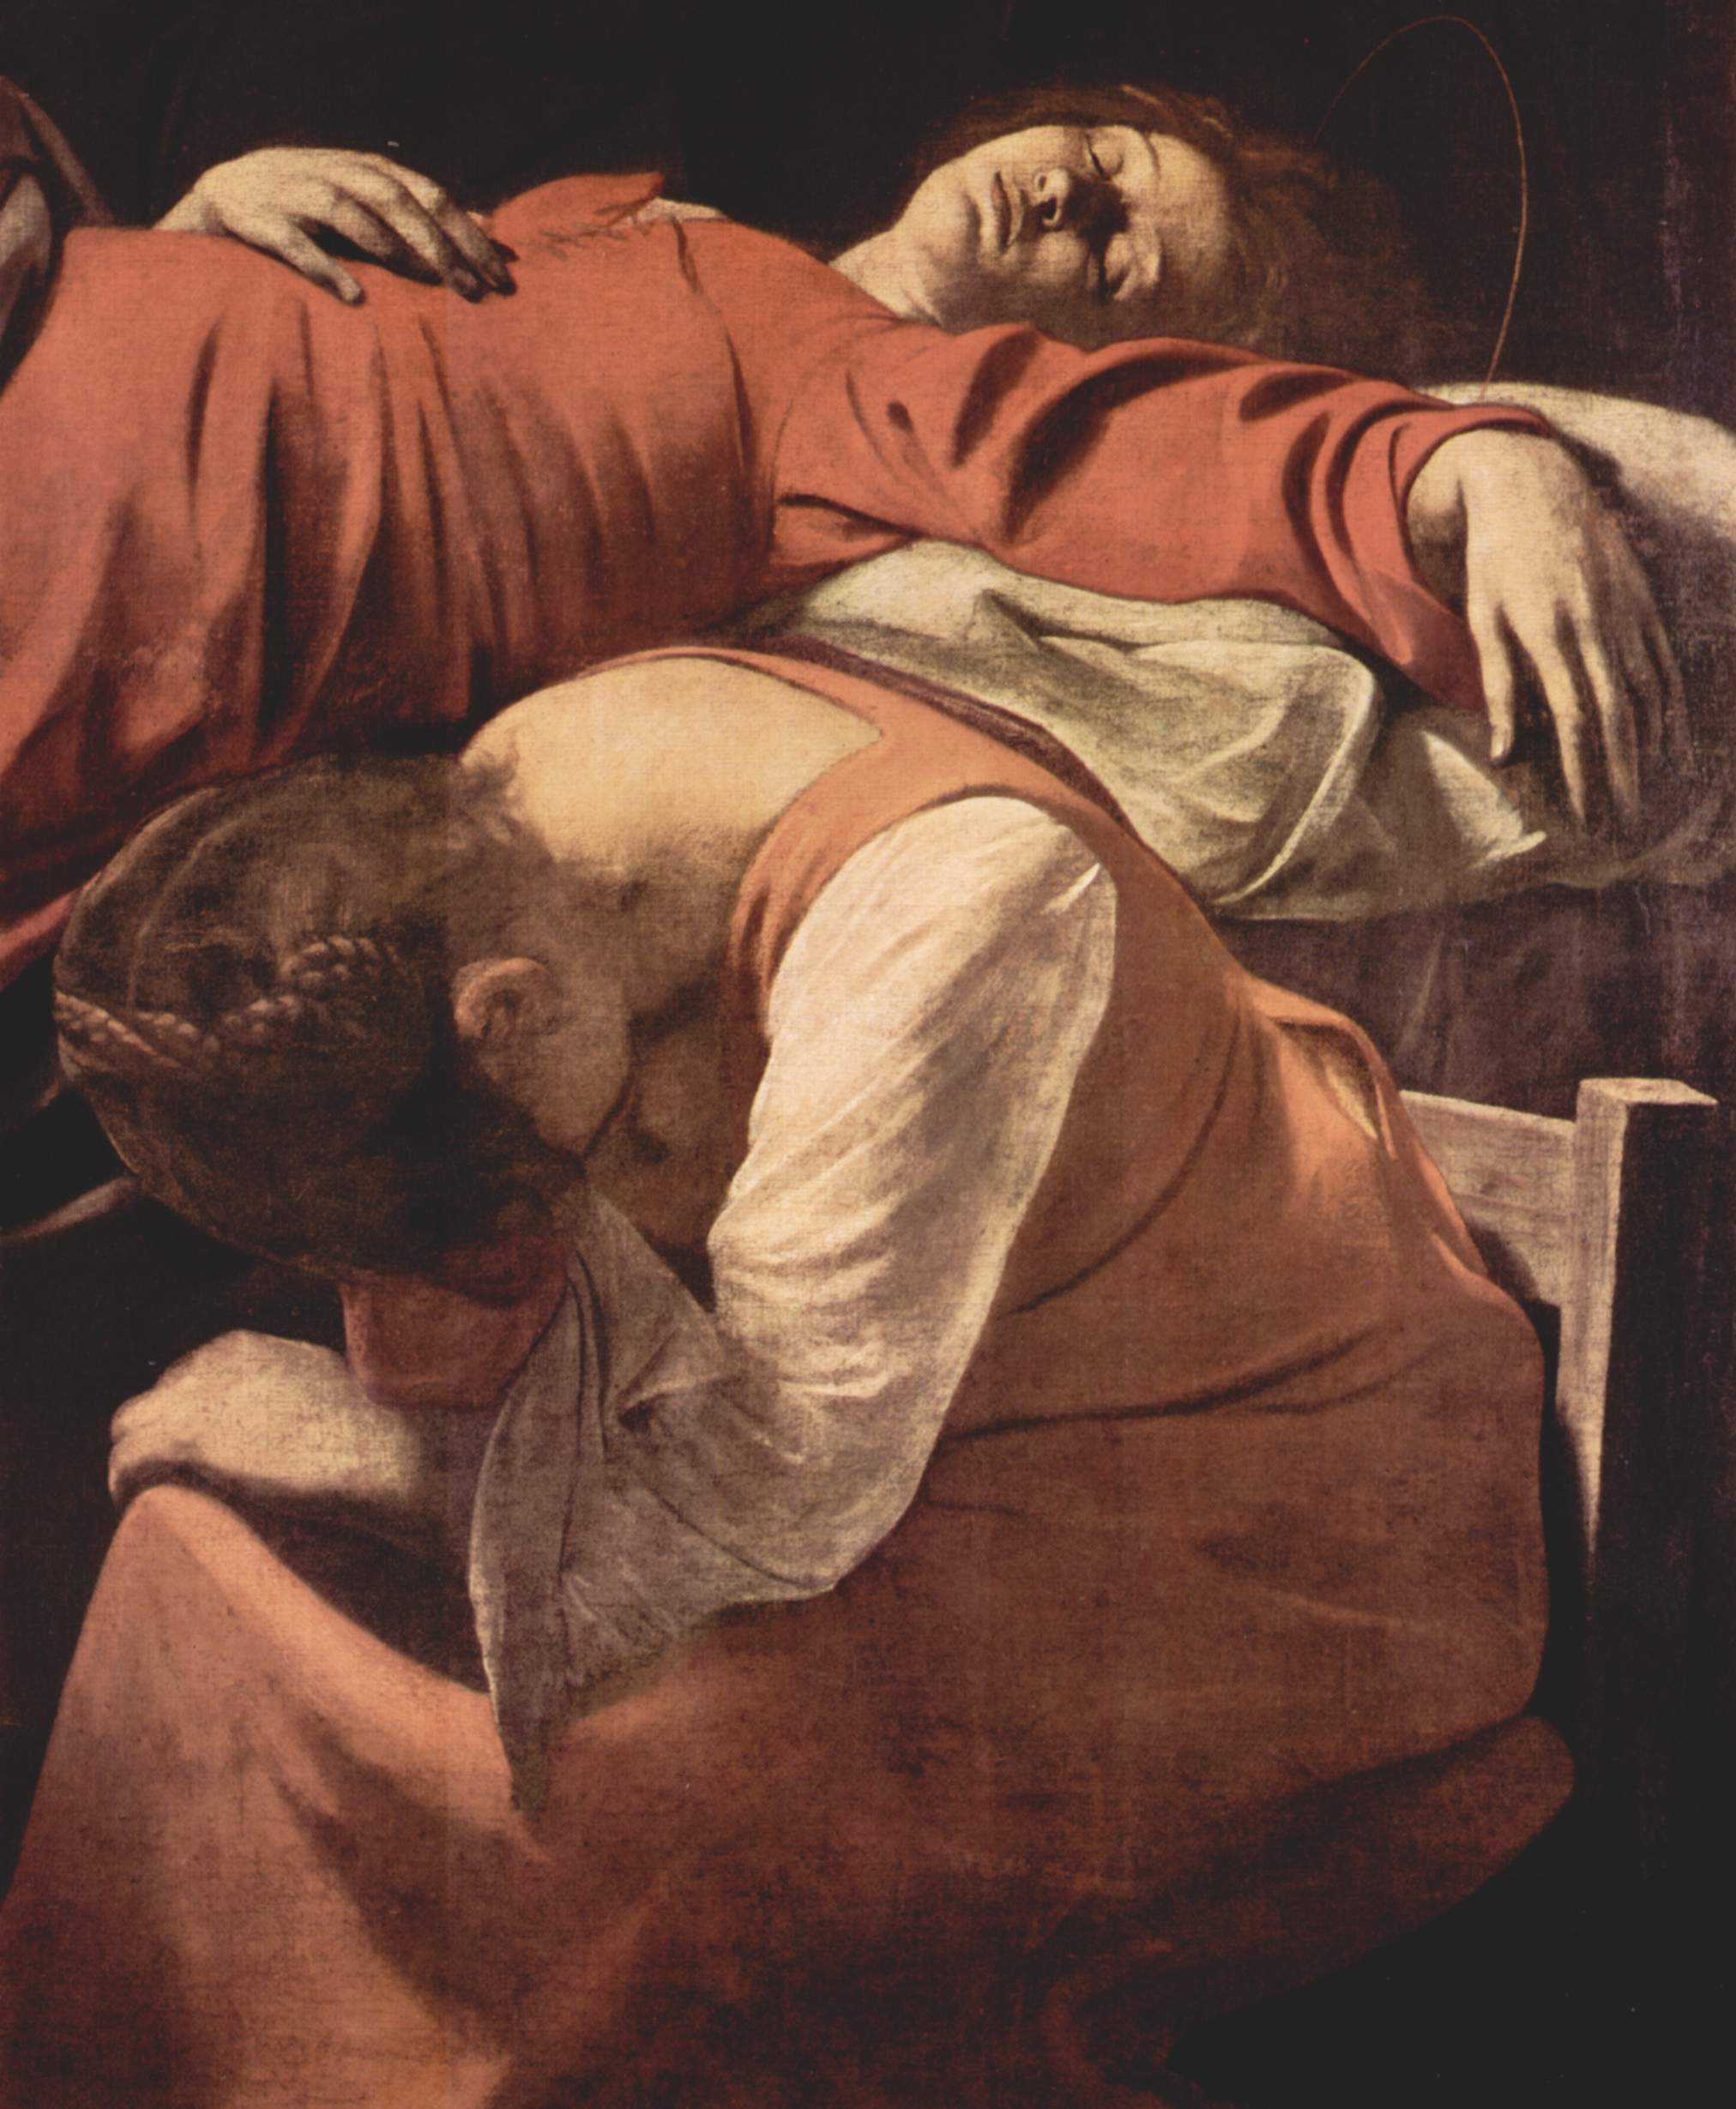 Смерть Марии. Деталь, Микеланджело Меризи де Караваджо